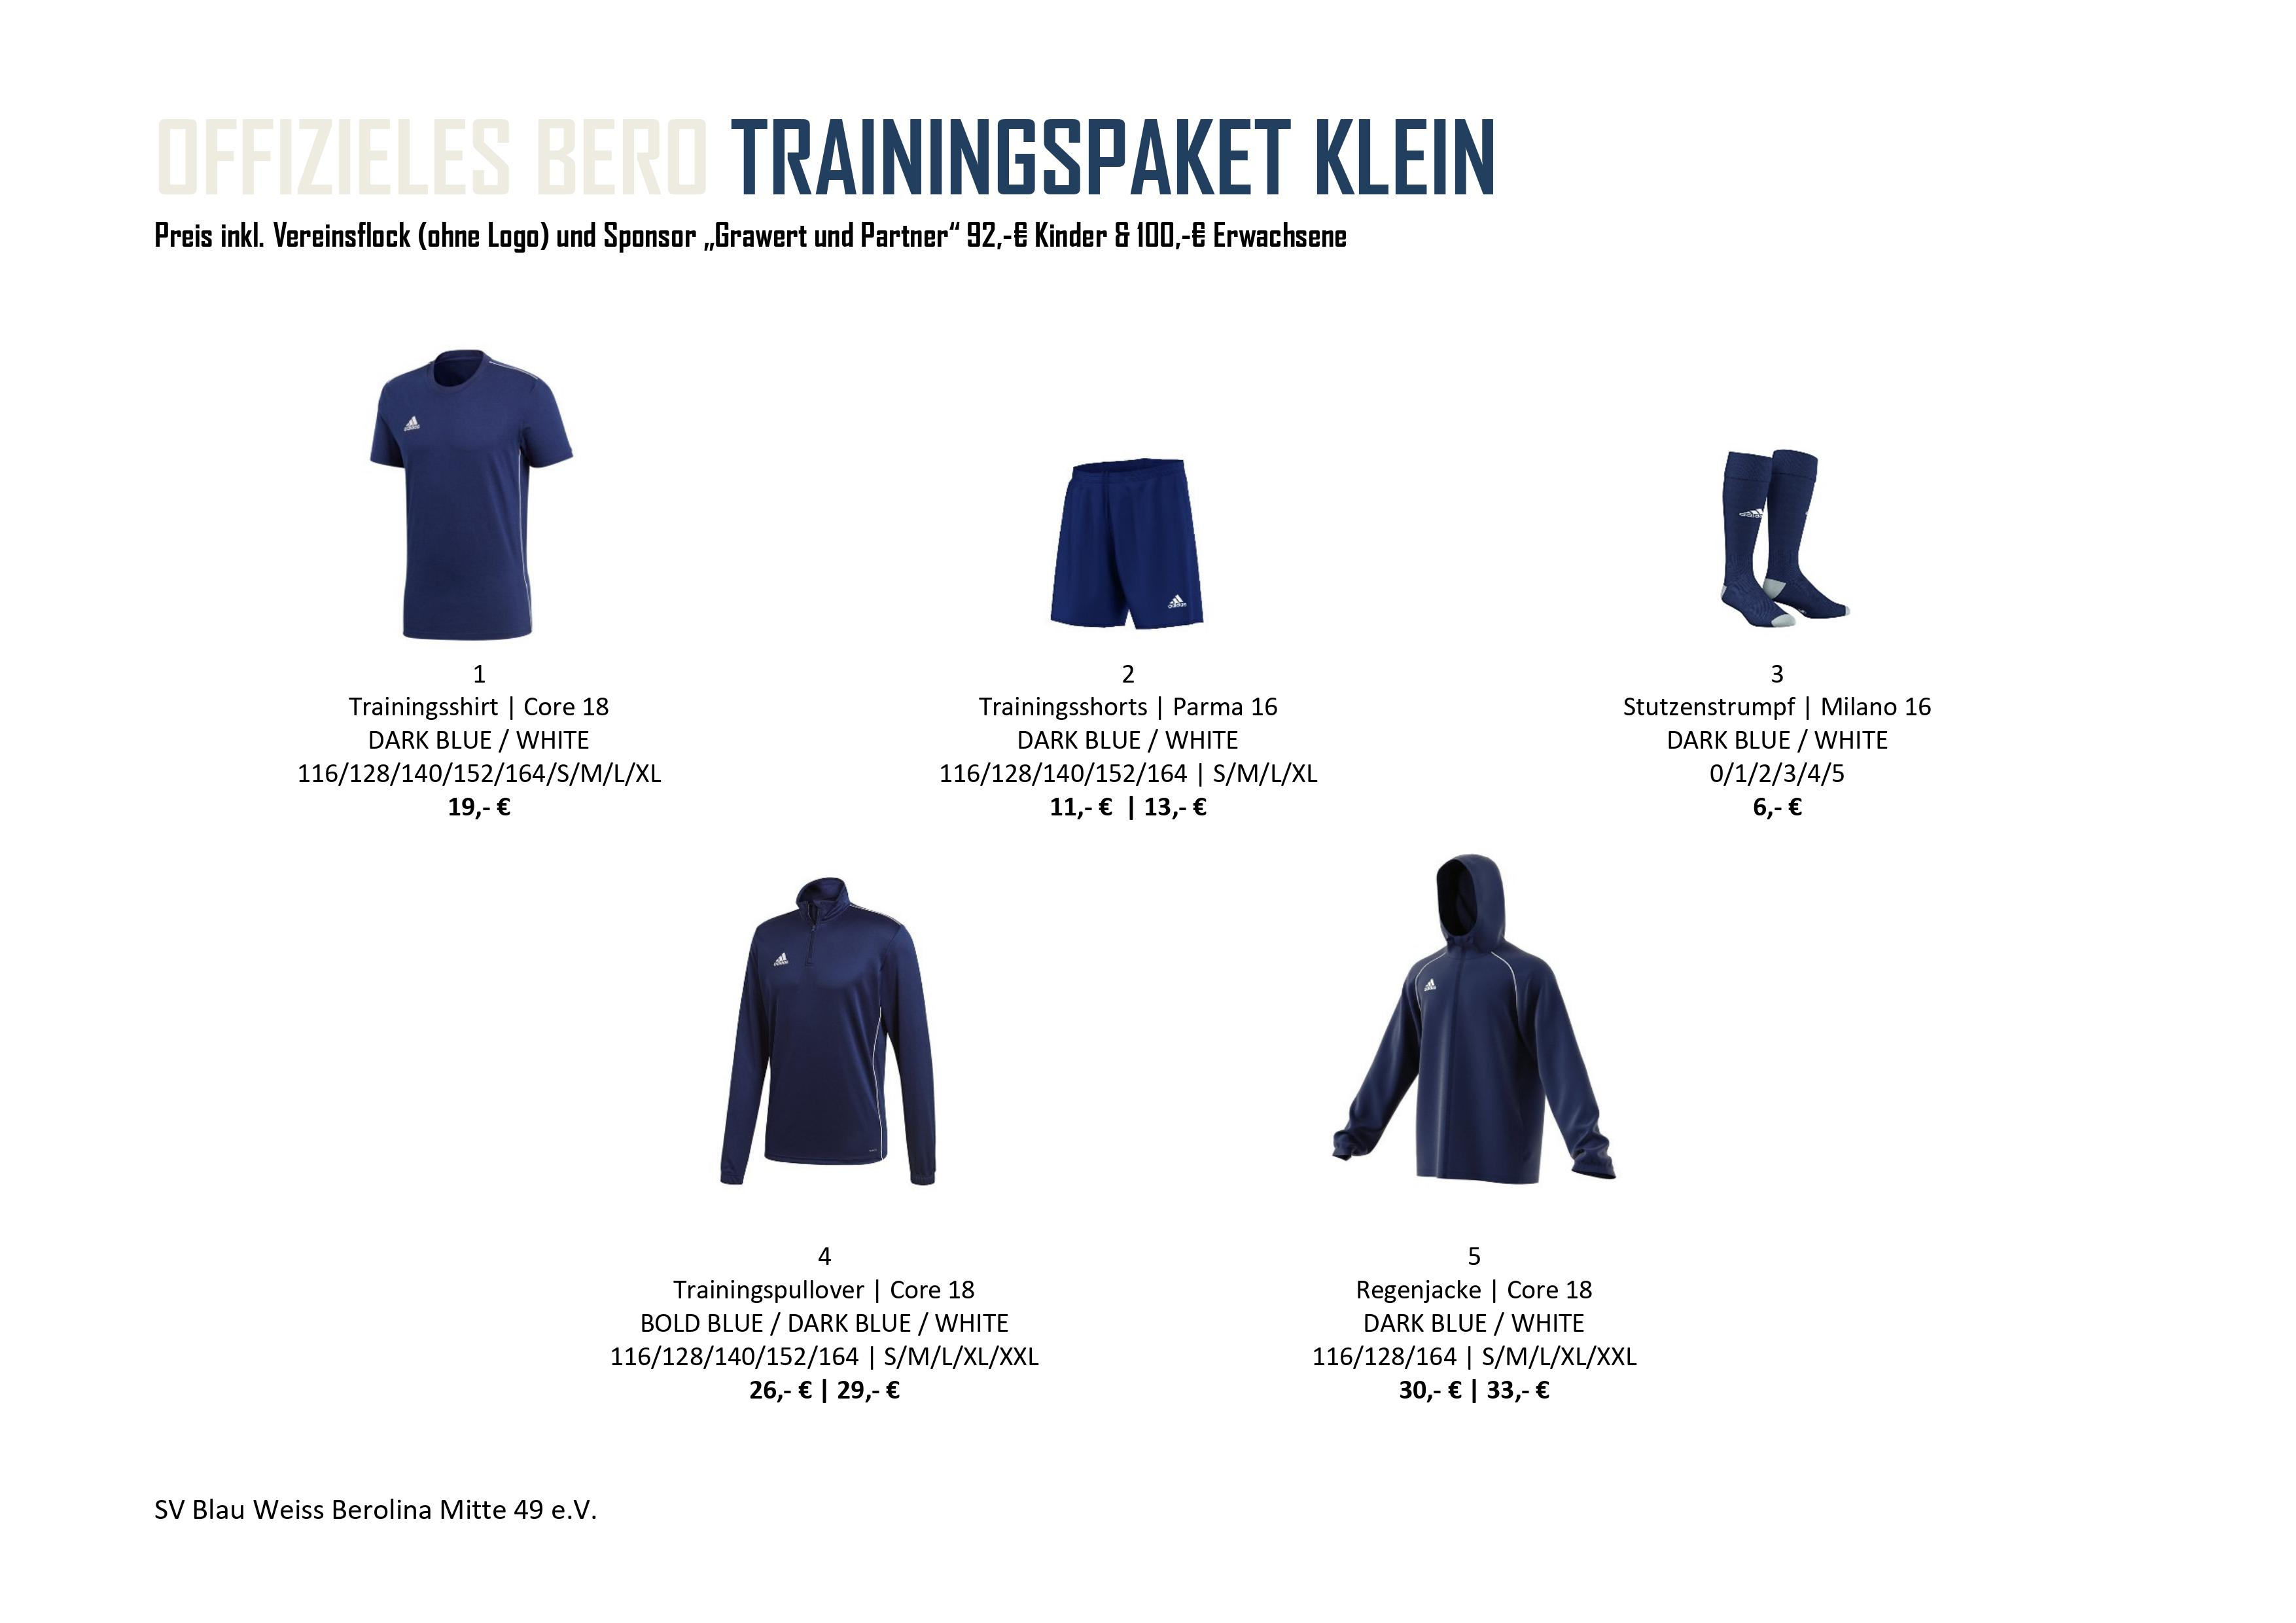 Trainingspaket Klein